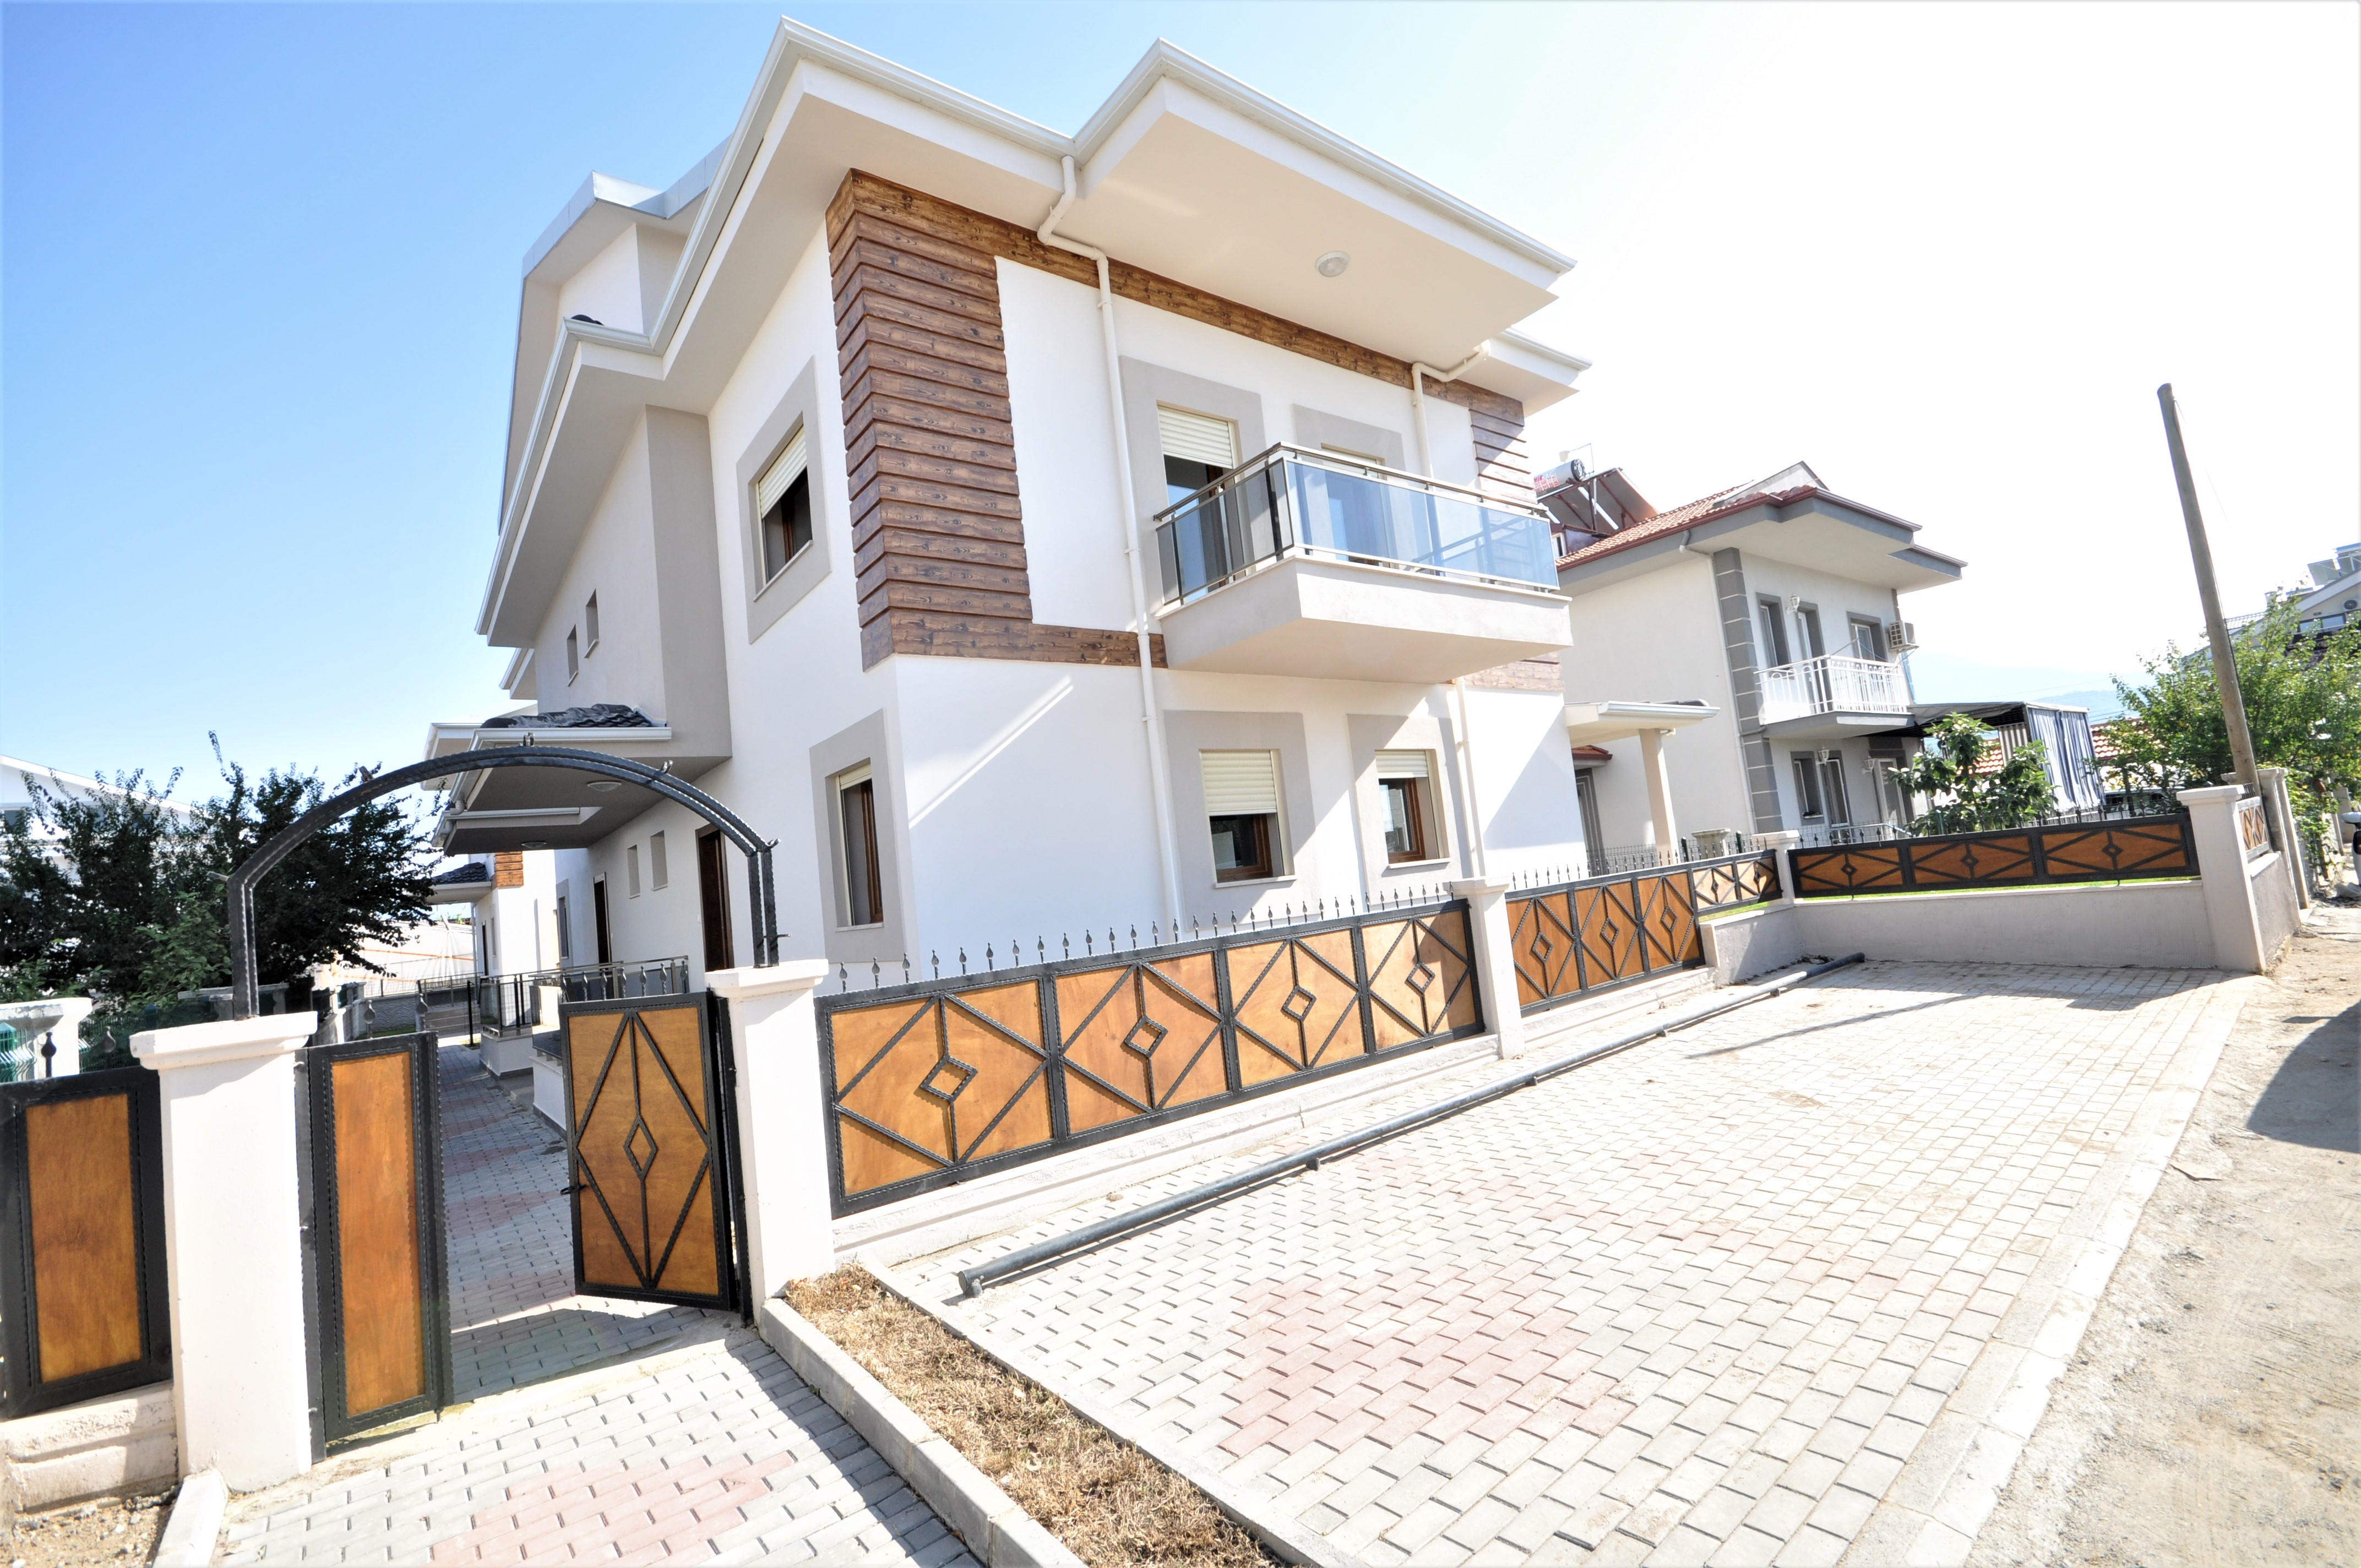 Brand New 4 Bedroom Triplex Villas with Garden For Sale